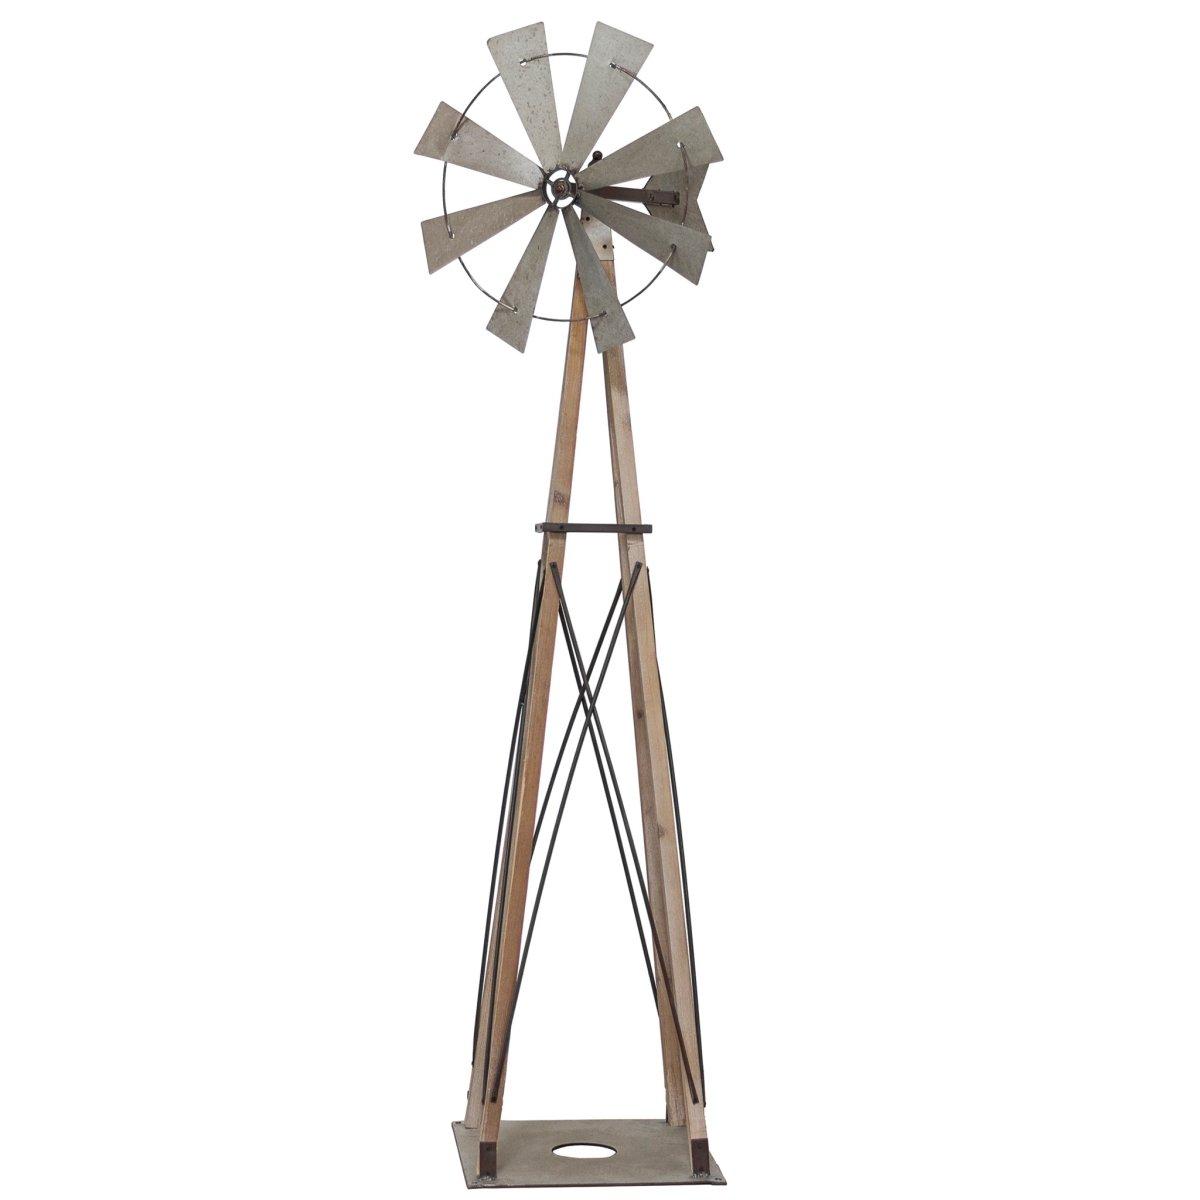 VIP International Wood Garden Windmill